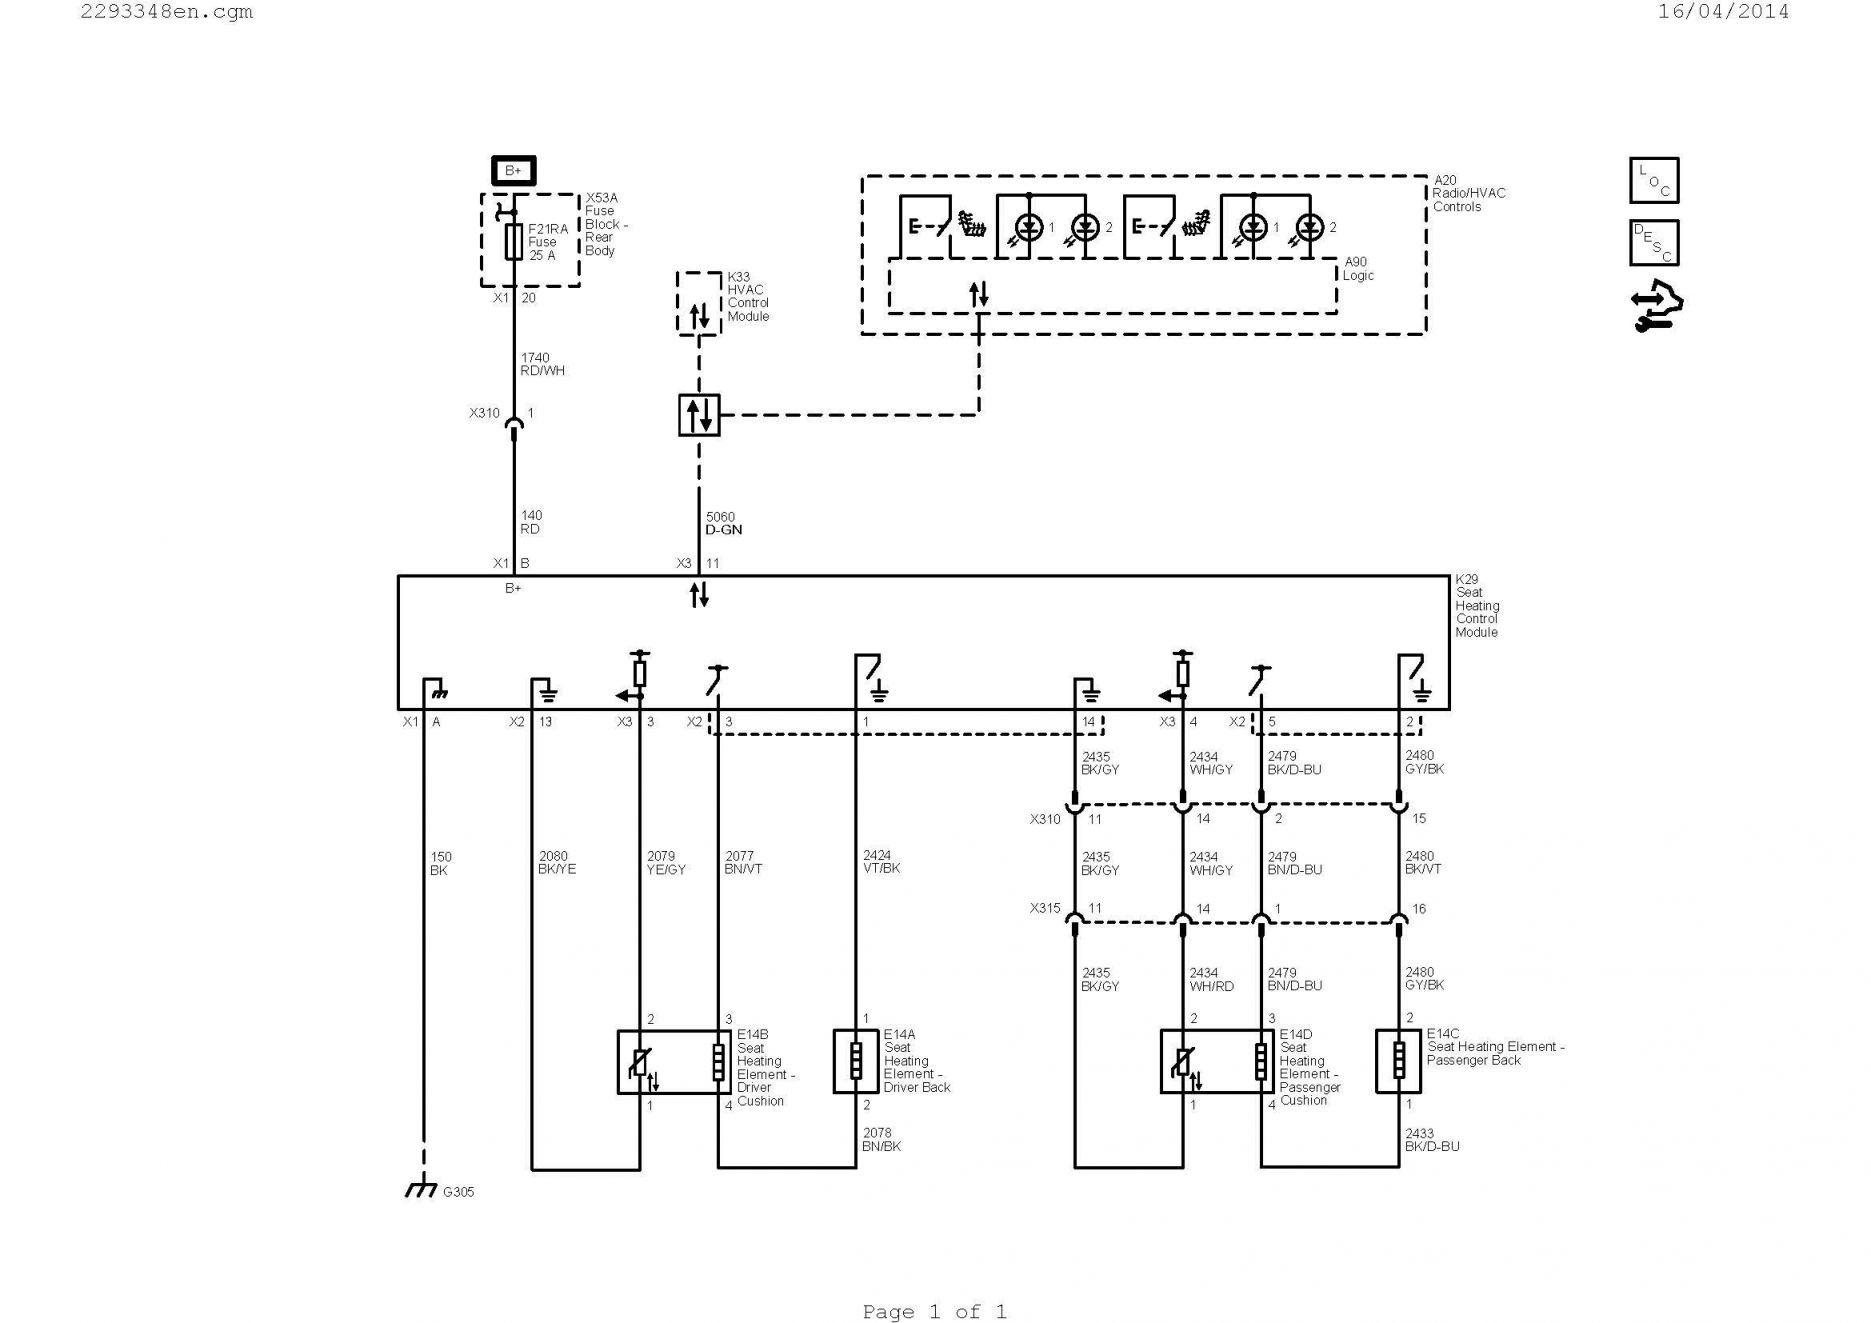 siemens motor wiring diagrams electronic schematics collections Motor Starter Circuit siemens motor control center wiring diagram motorcyclepict cosiemens motor wiring diagrams lose